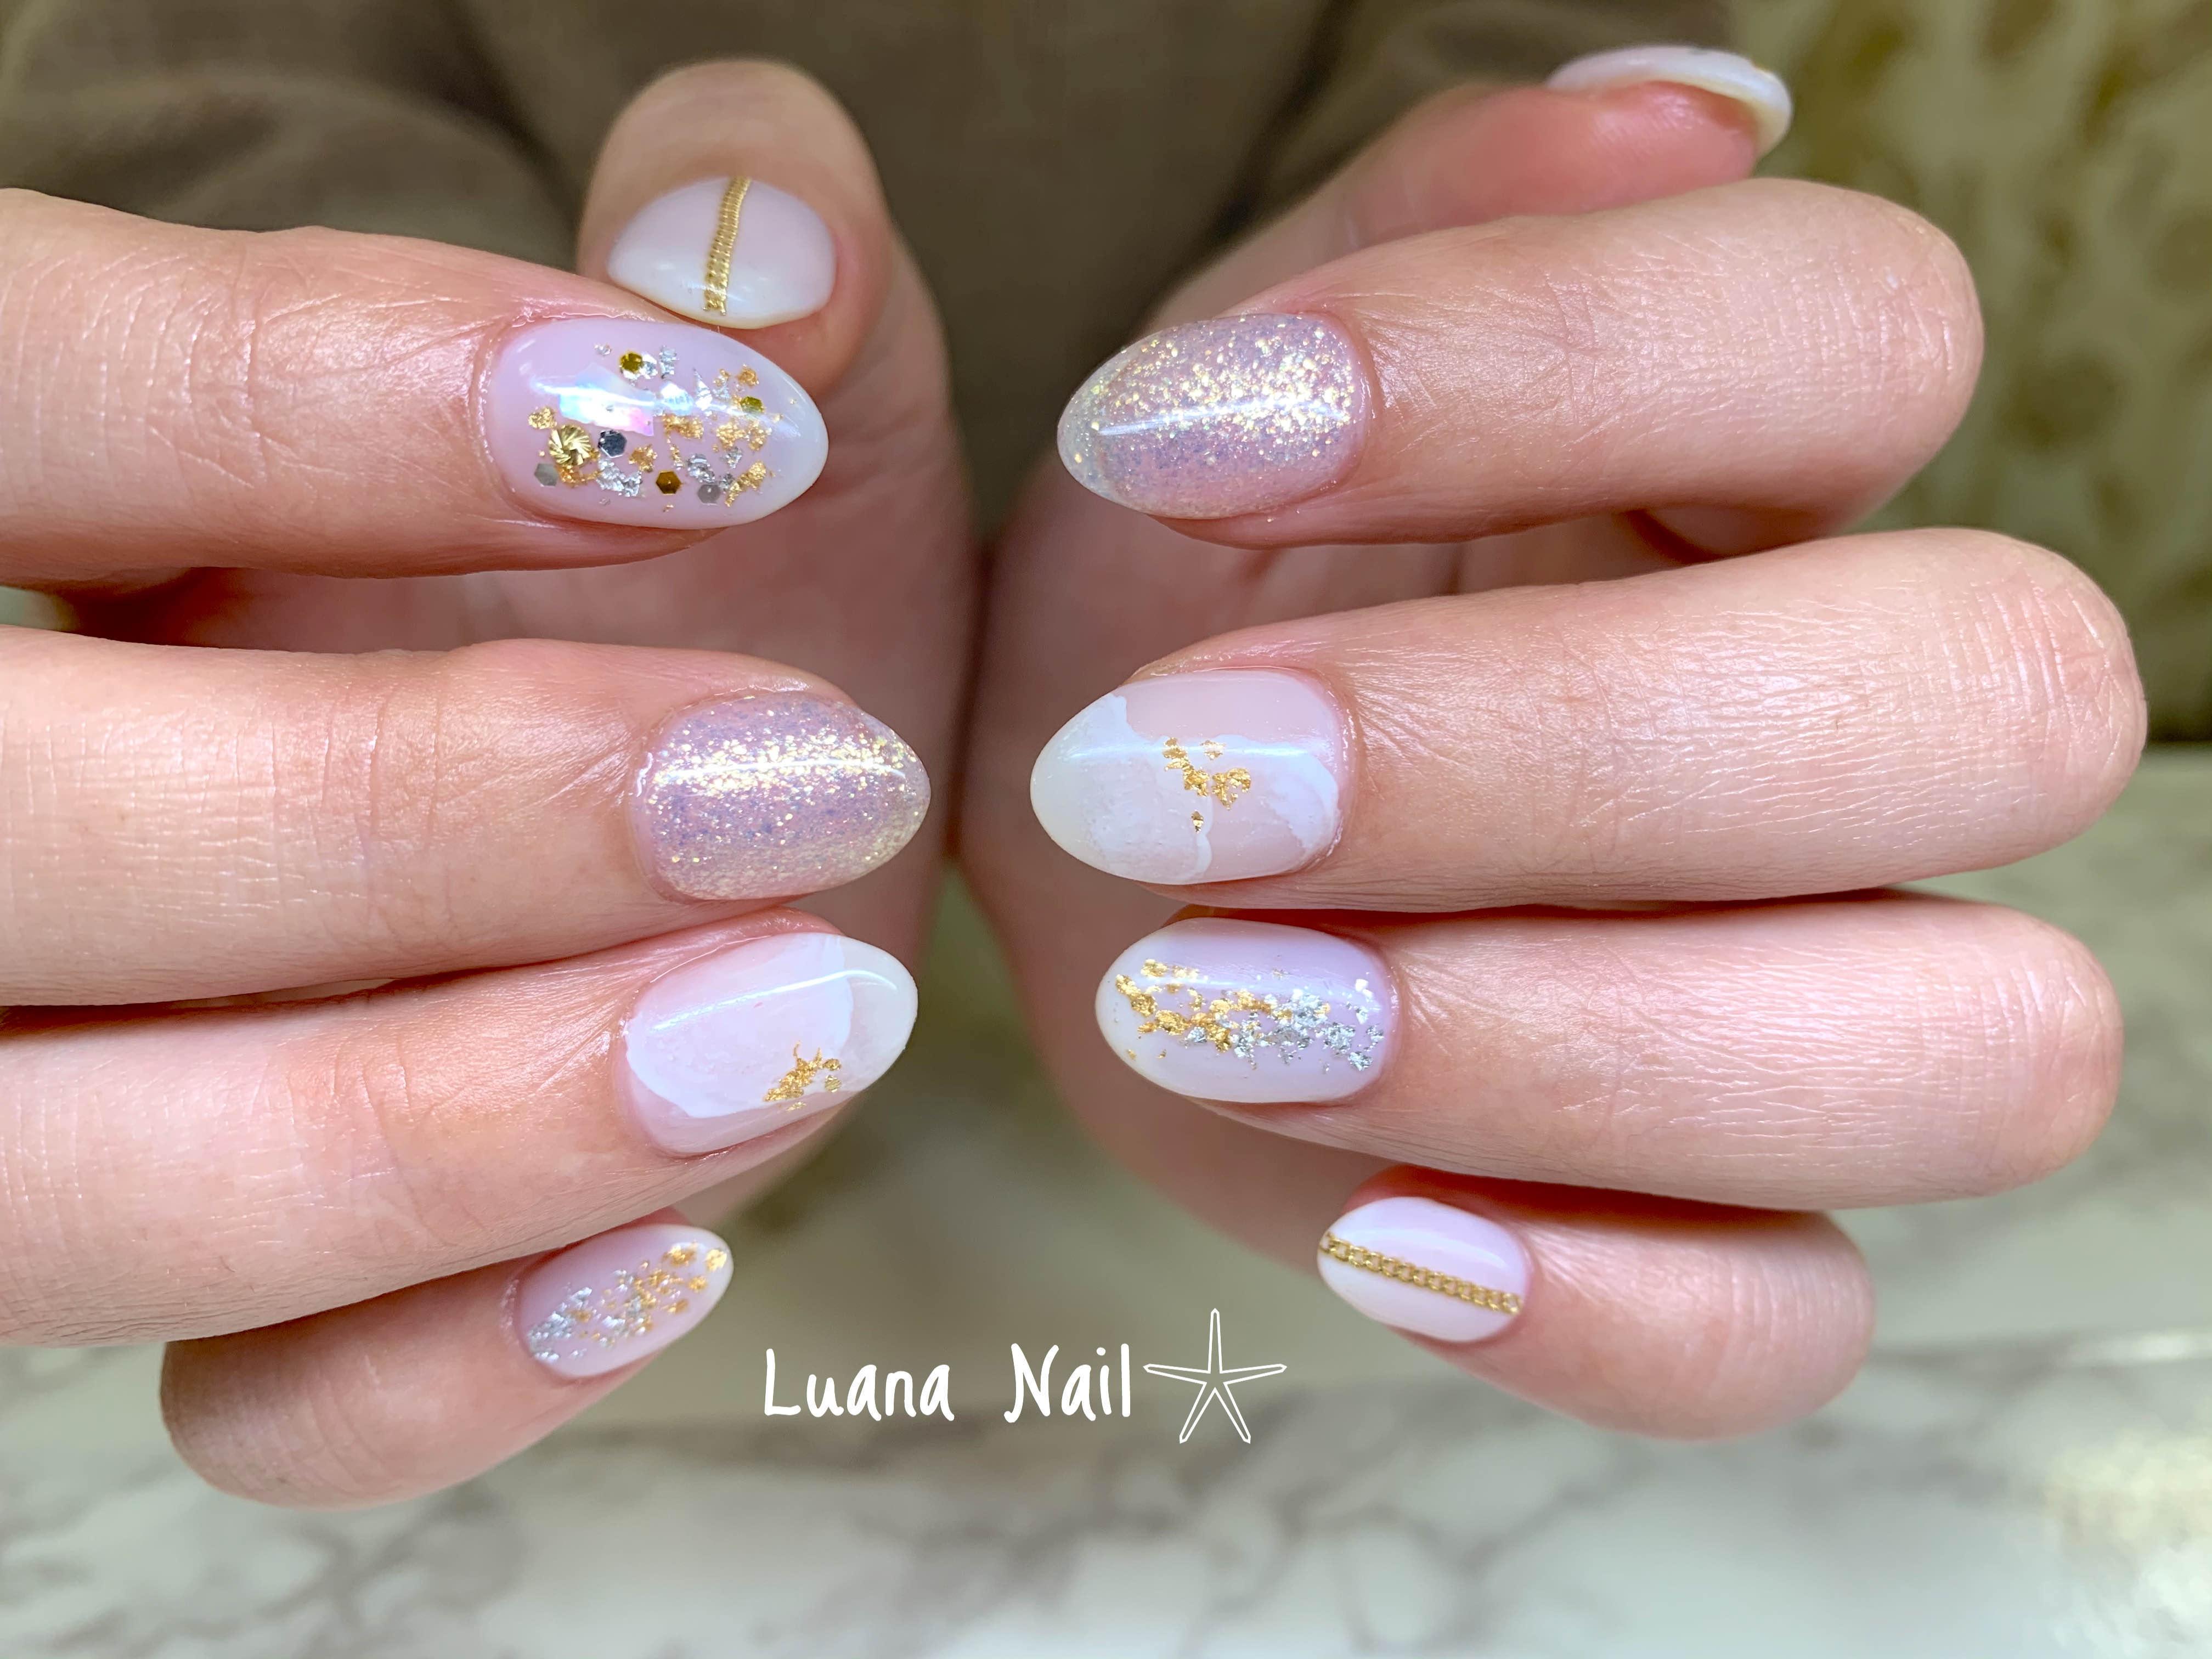 treatment Luana Nailのネイル